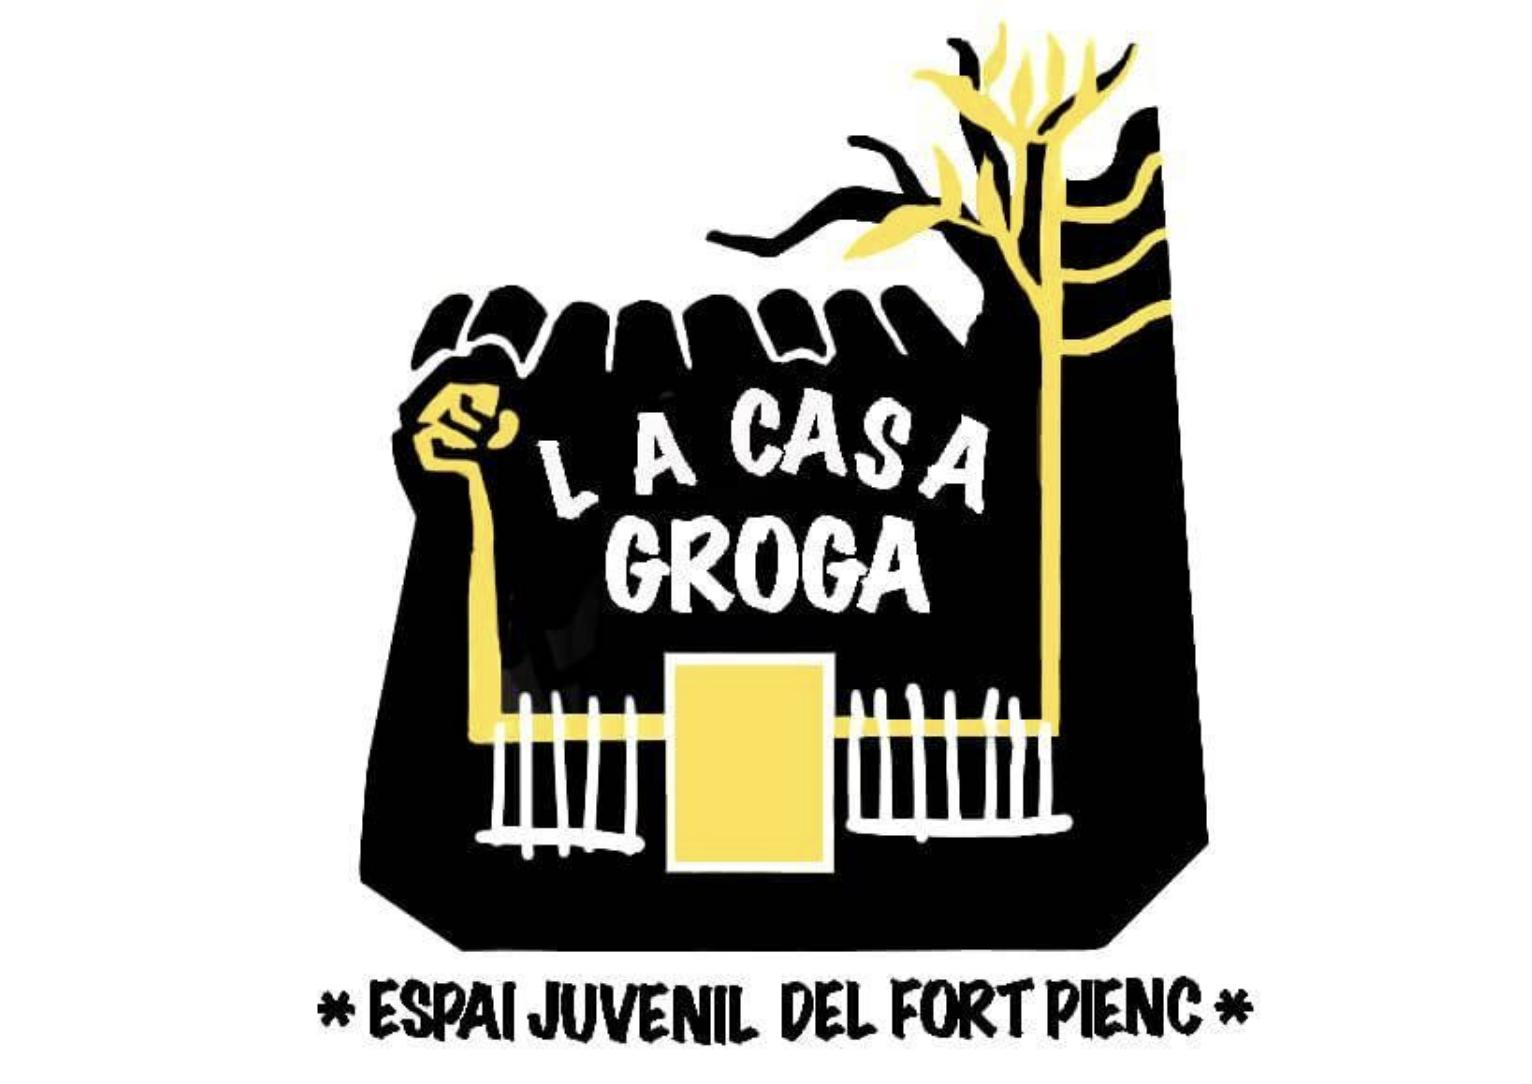 Espai de suport Fort Pienc